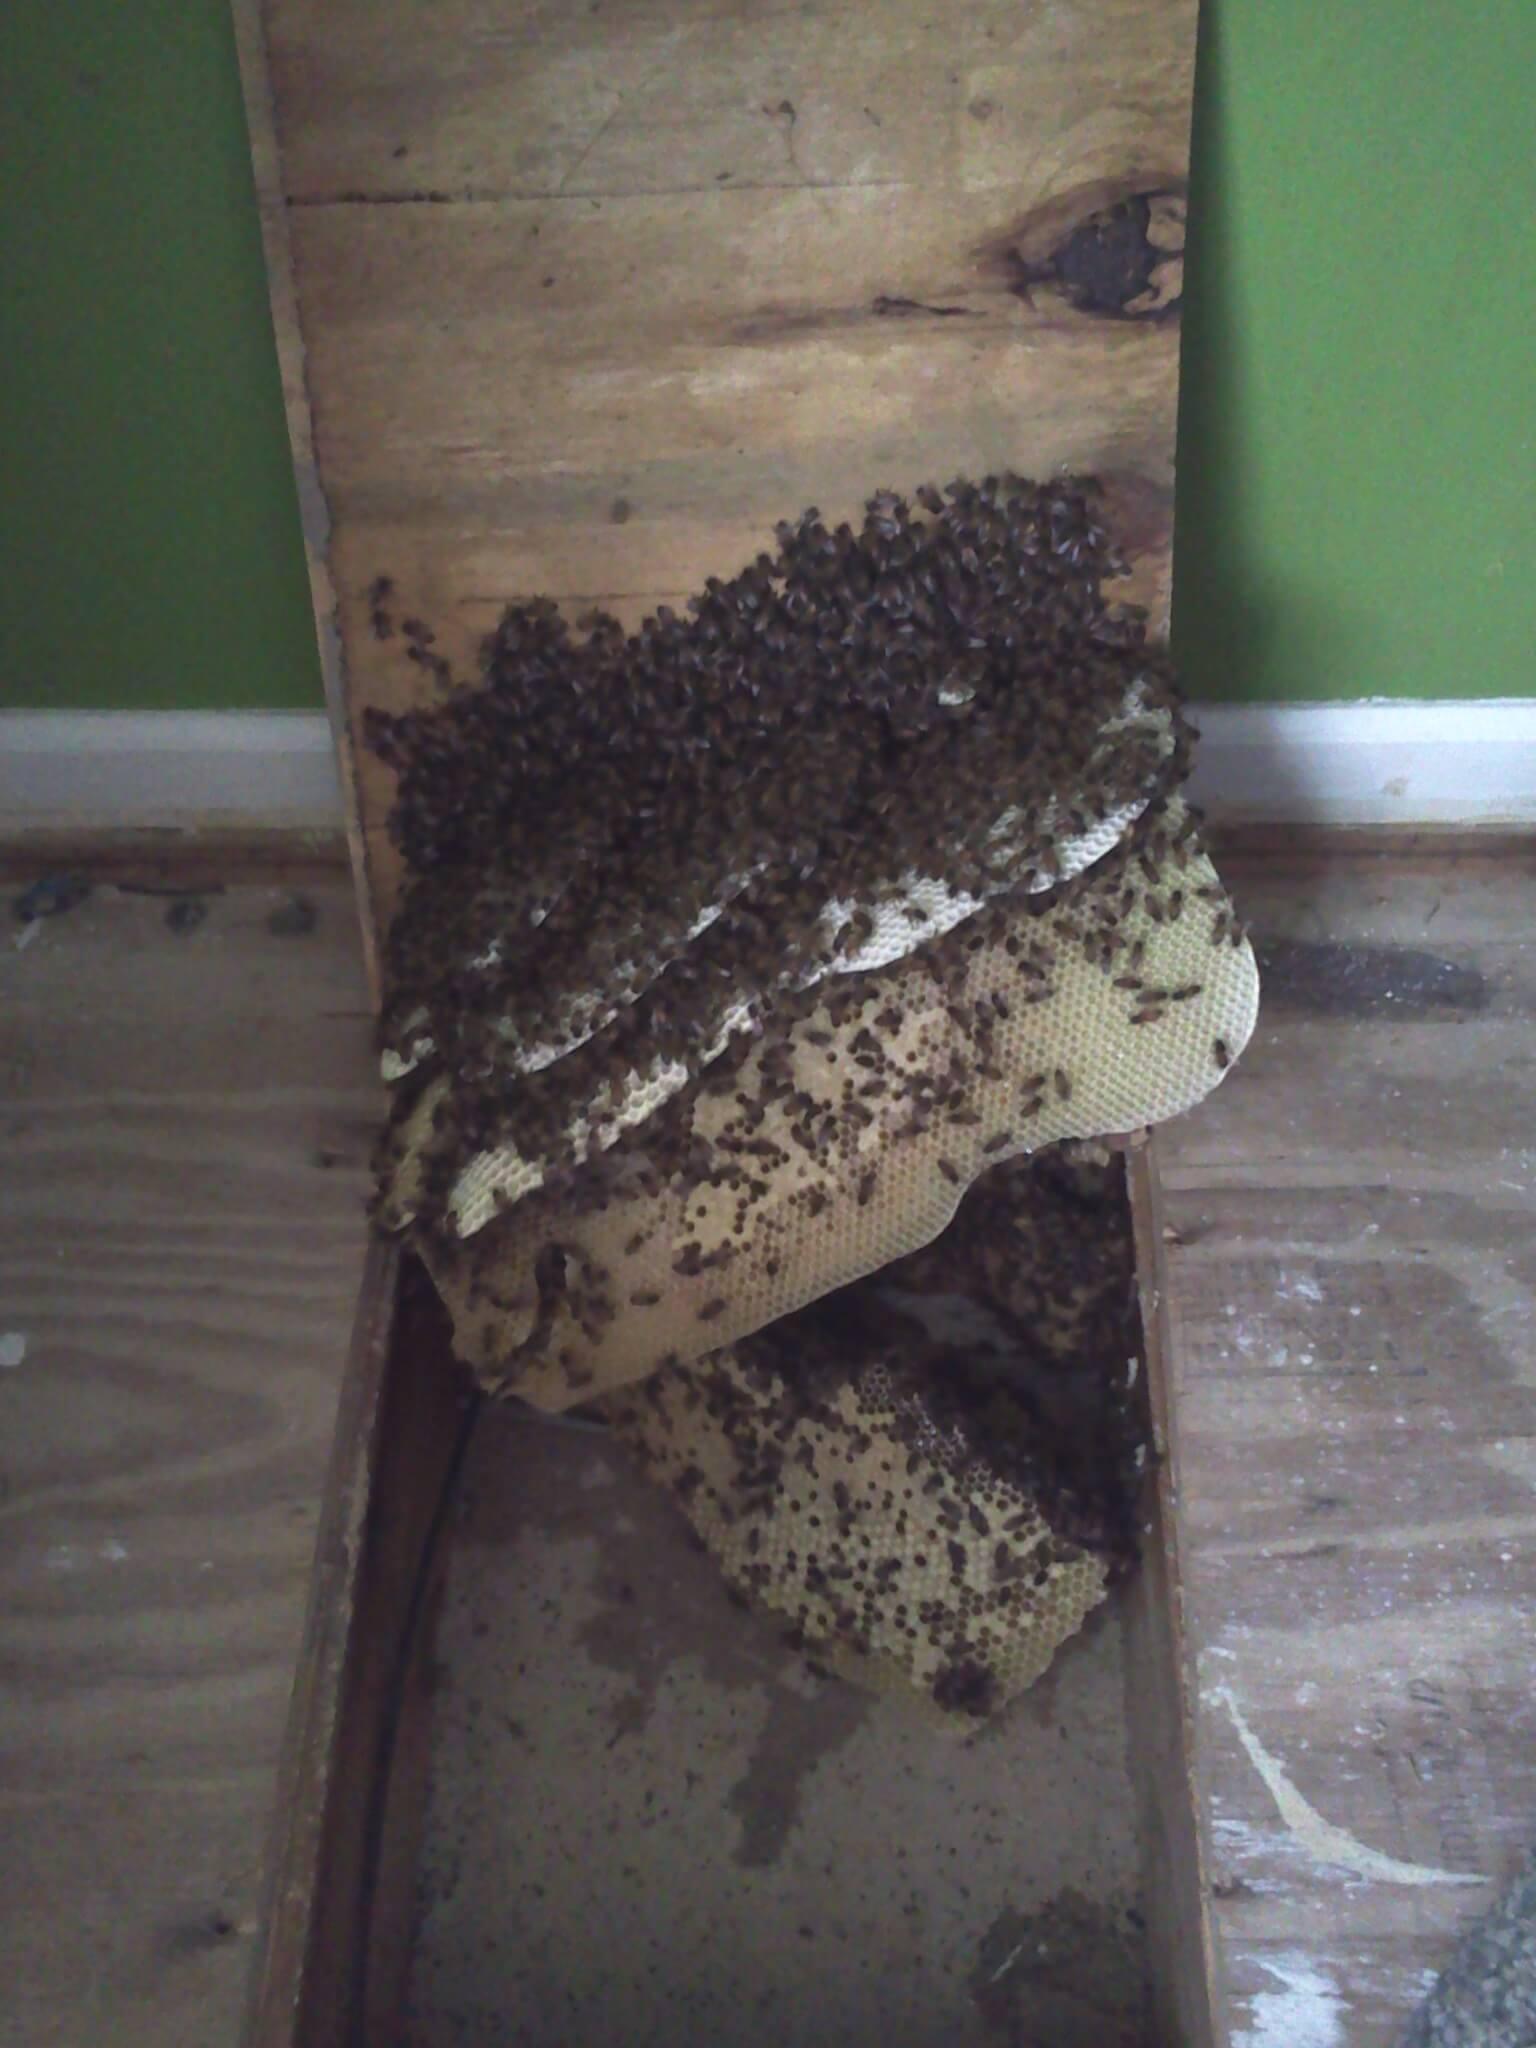 Live Honey Bee Removal Near Birmingham, AL - Southeast Bee Removal